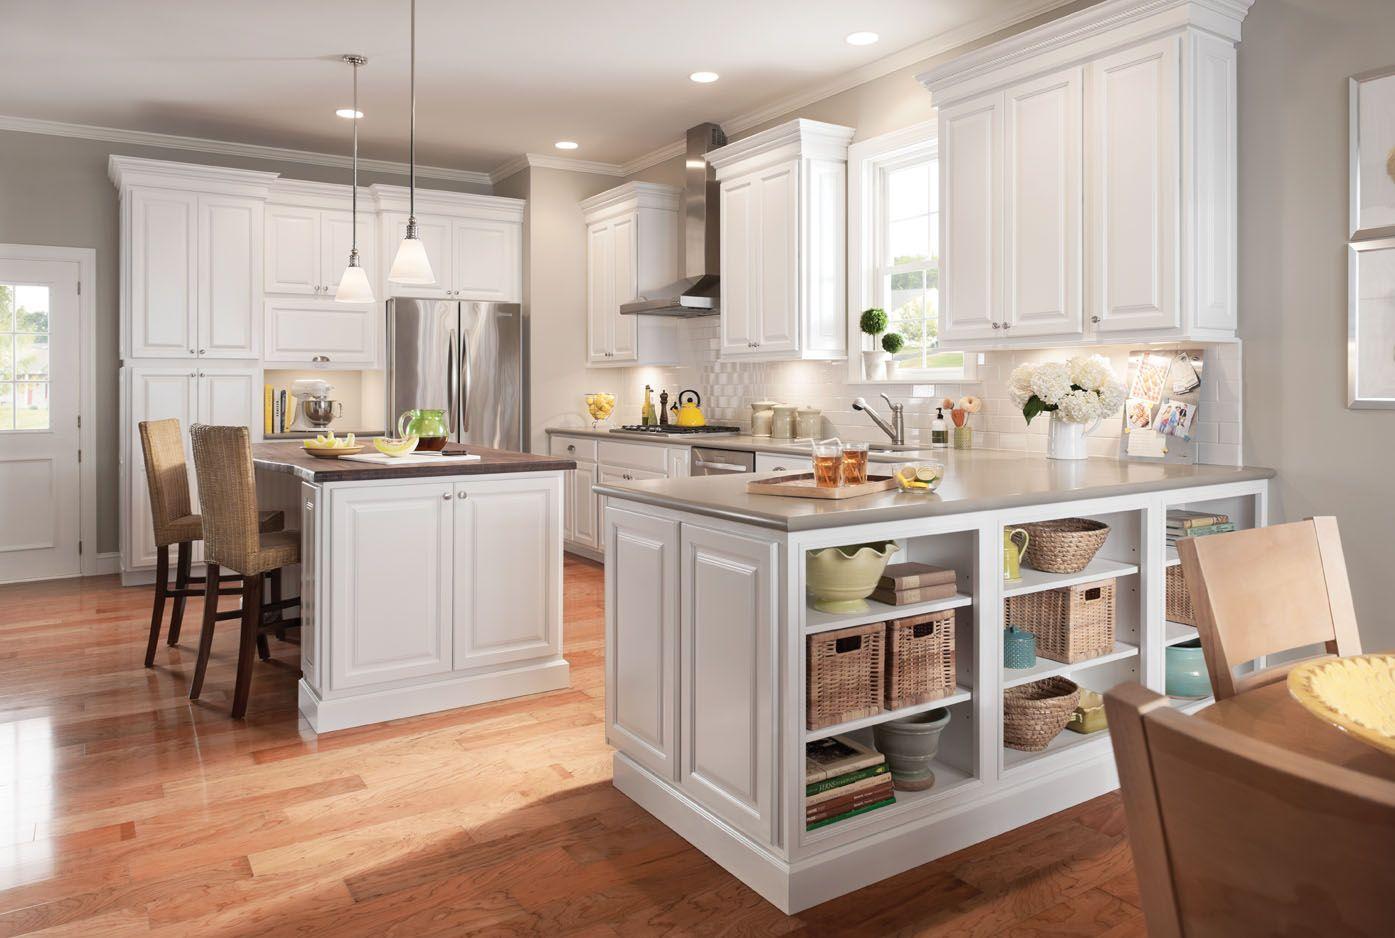 Best American Woodmark Newport Maple Linen Kitchen Design 400 x 300